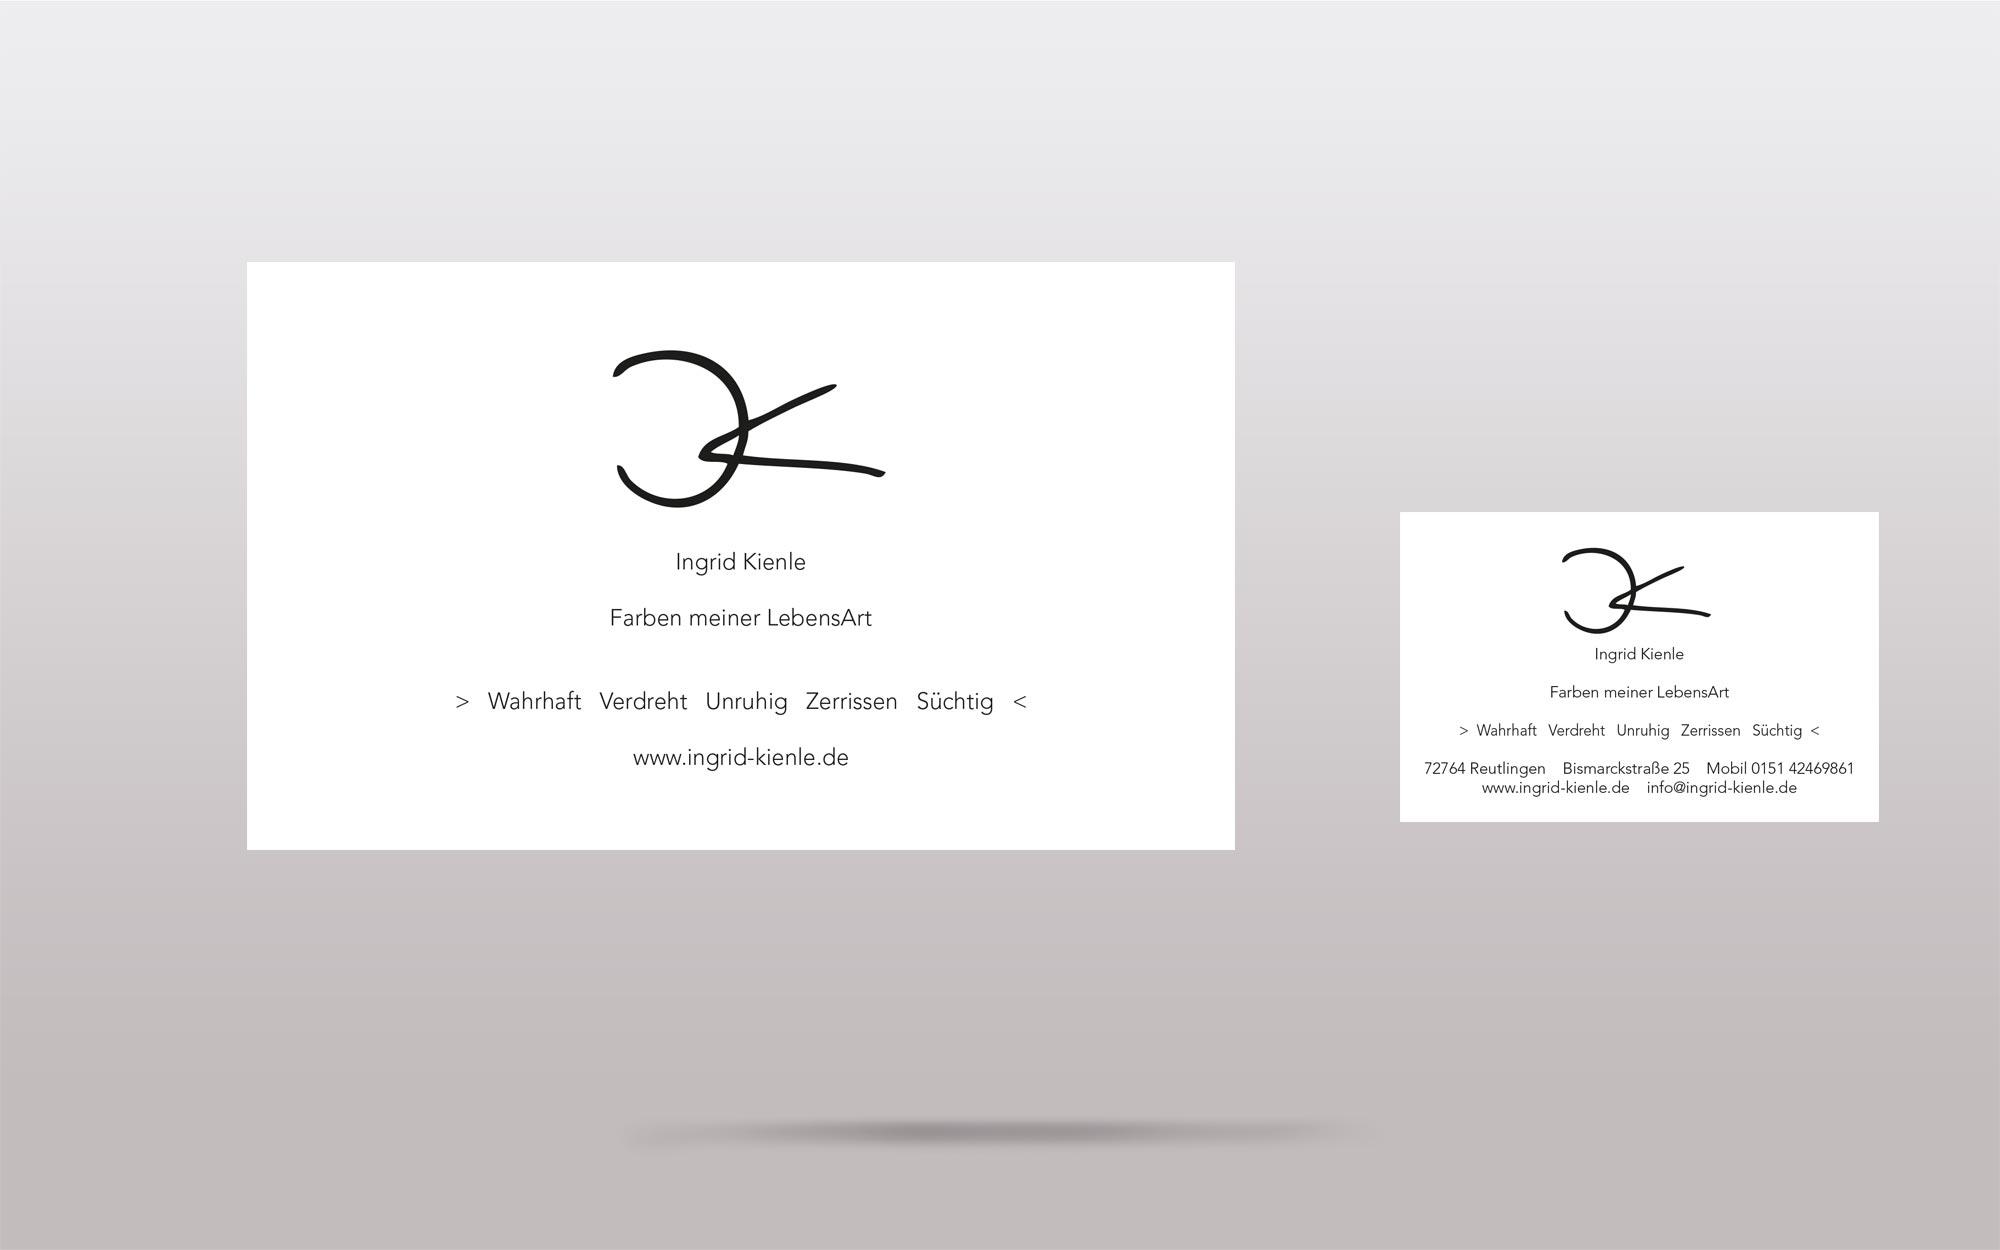 Ingrid Kienle - Start-Up - Internetseite